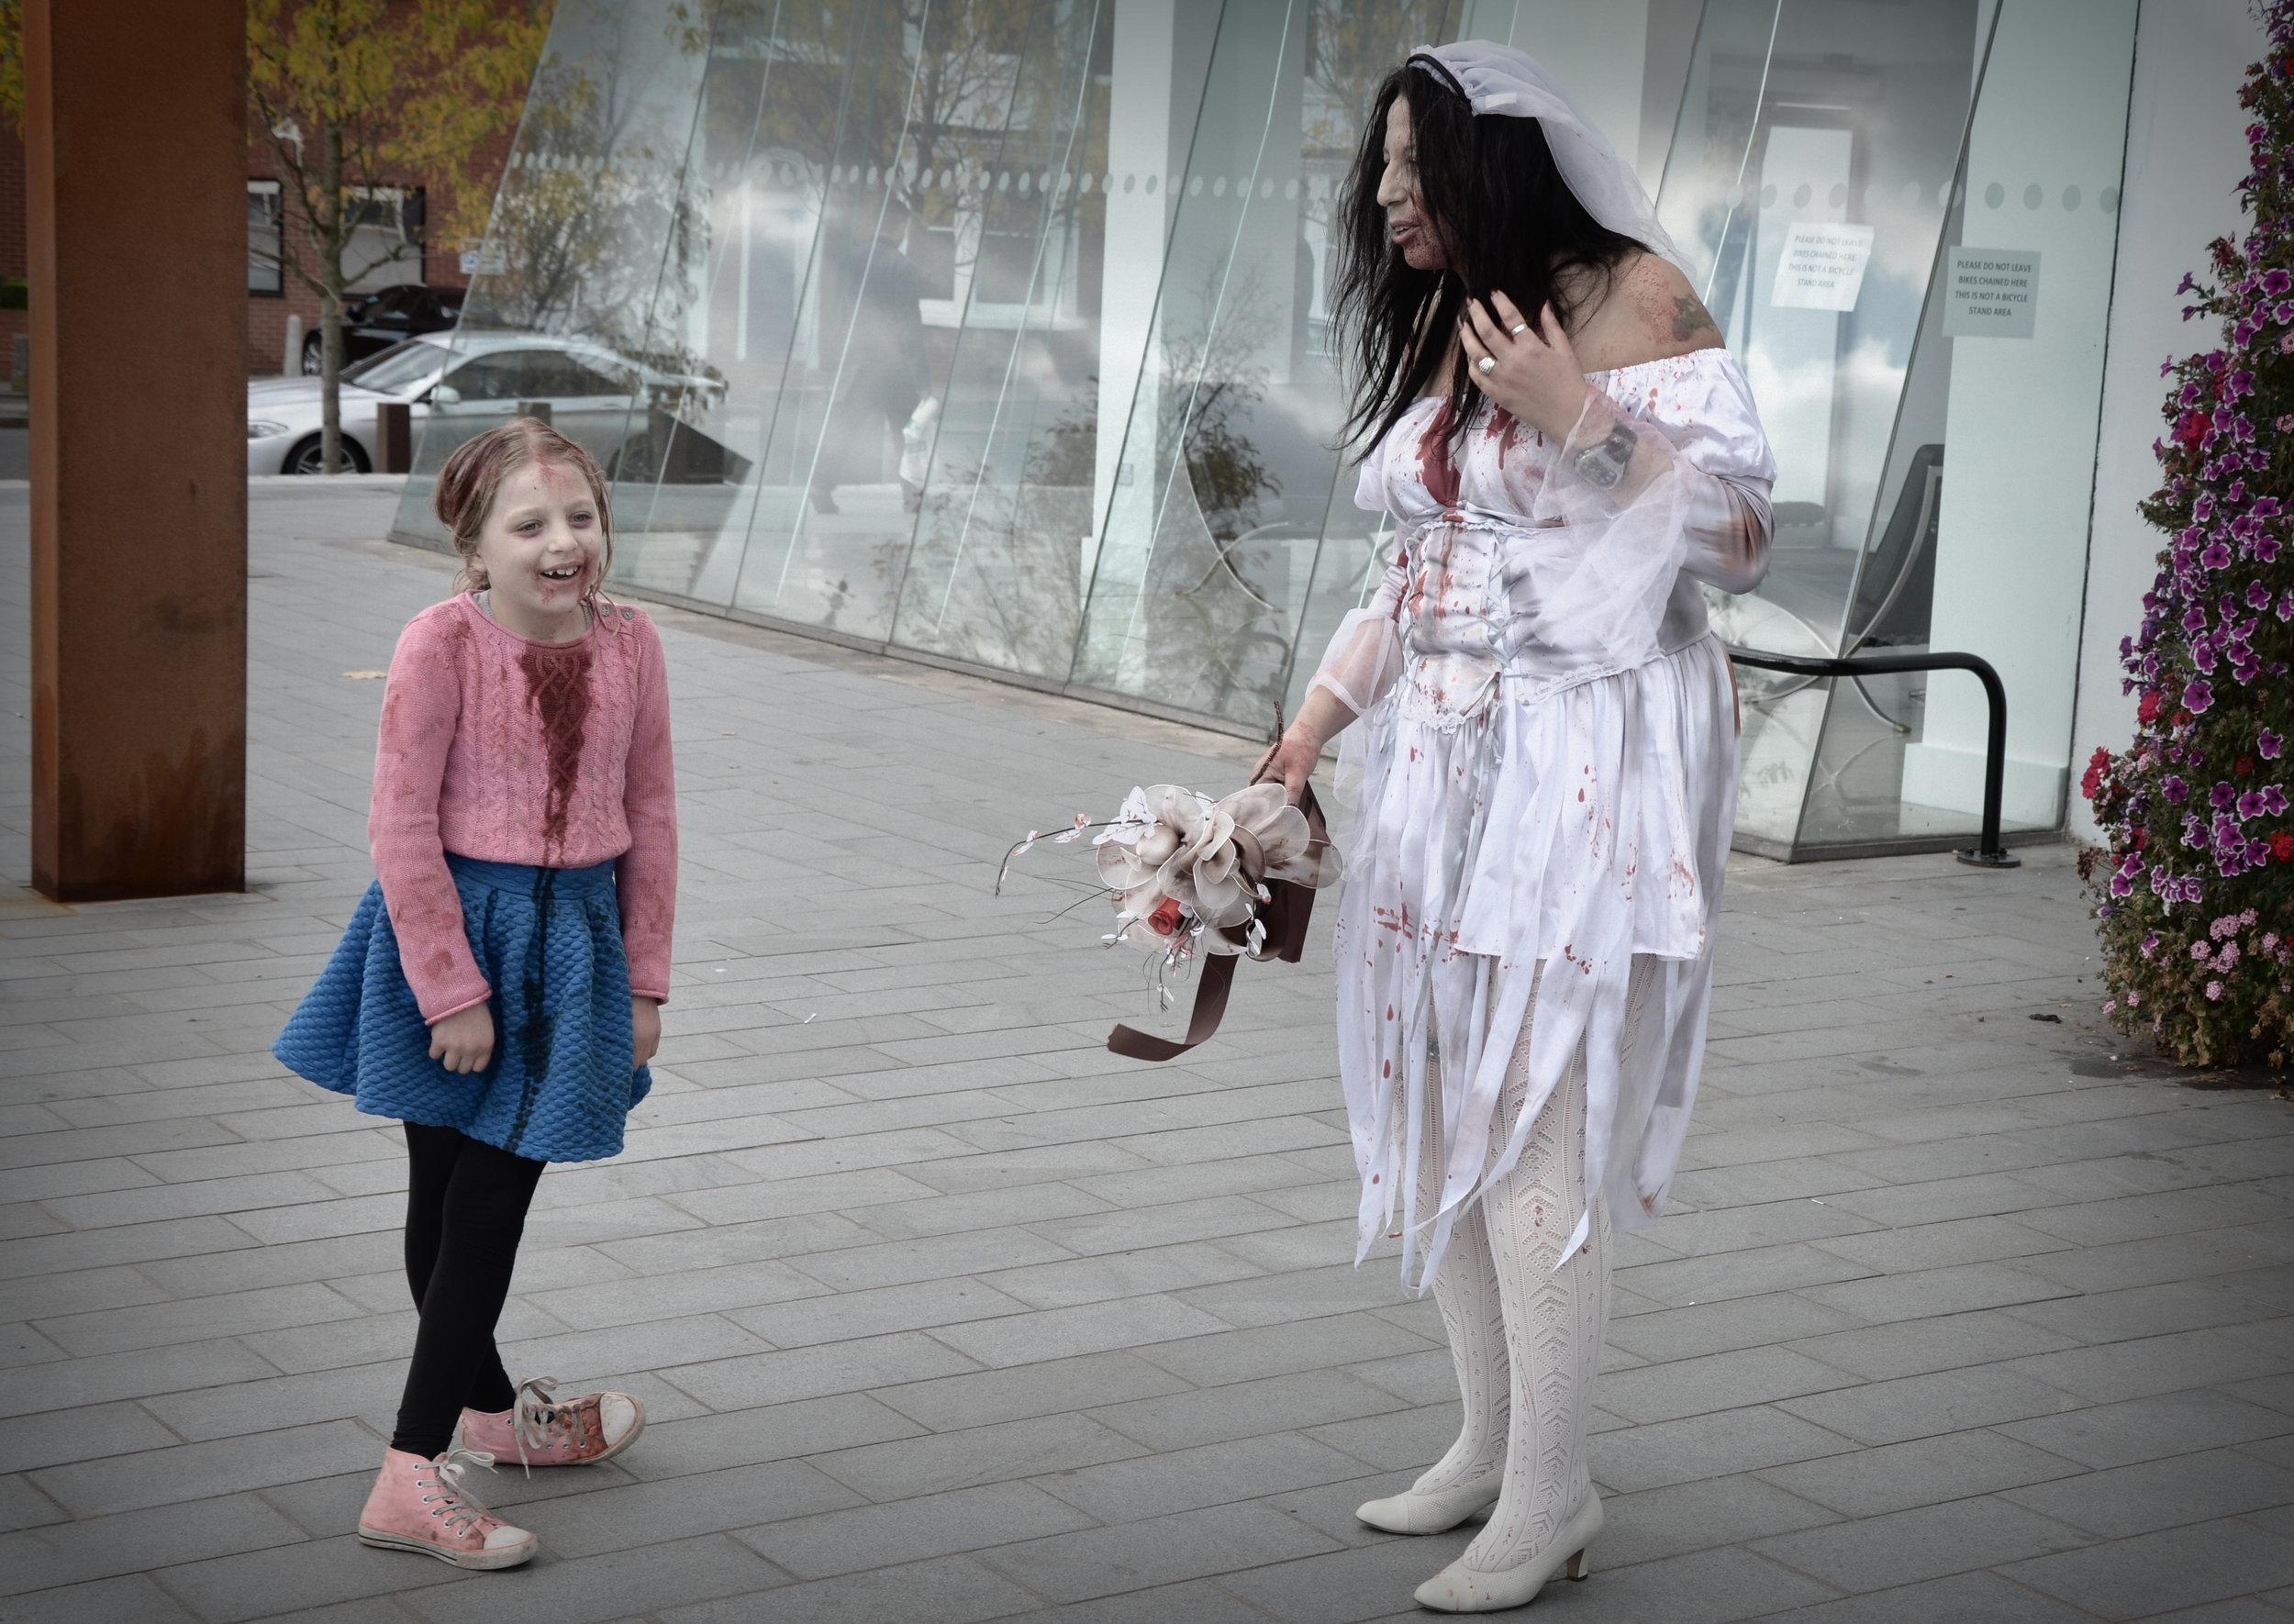 Zombies, Still film set the Jewellery Quarter